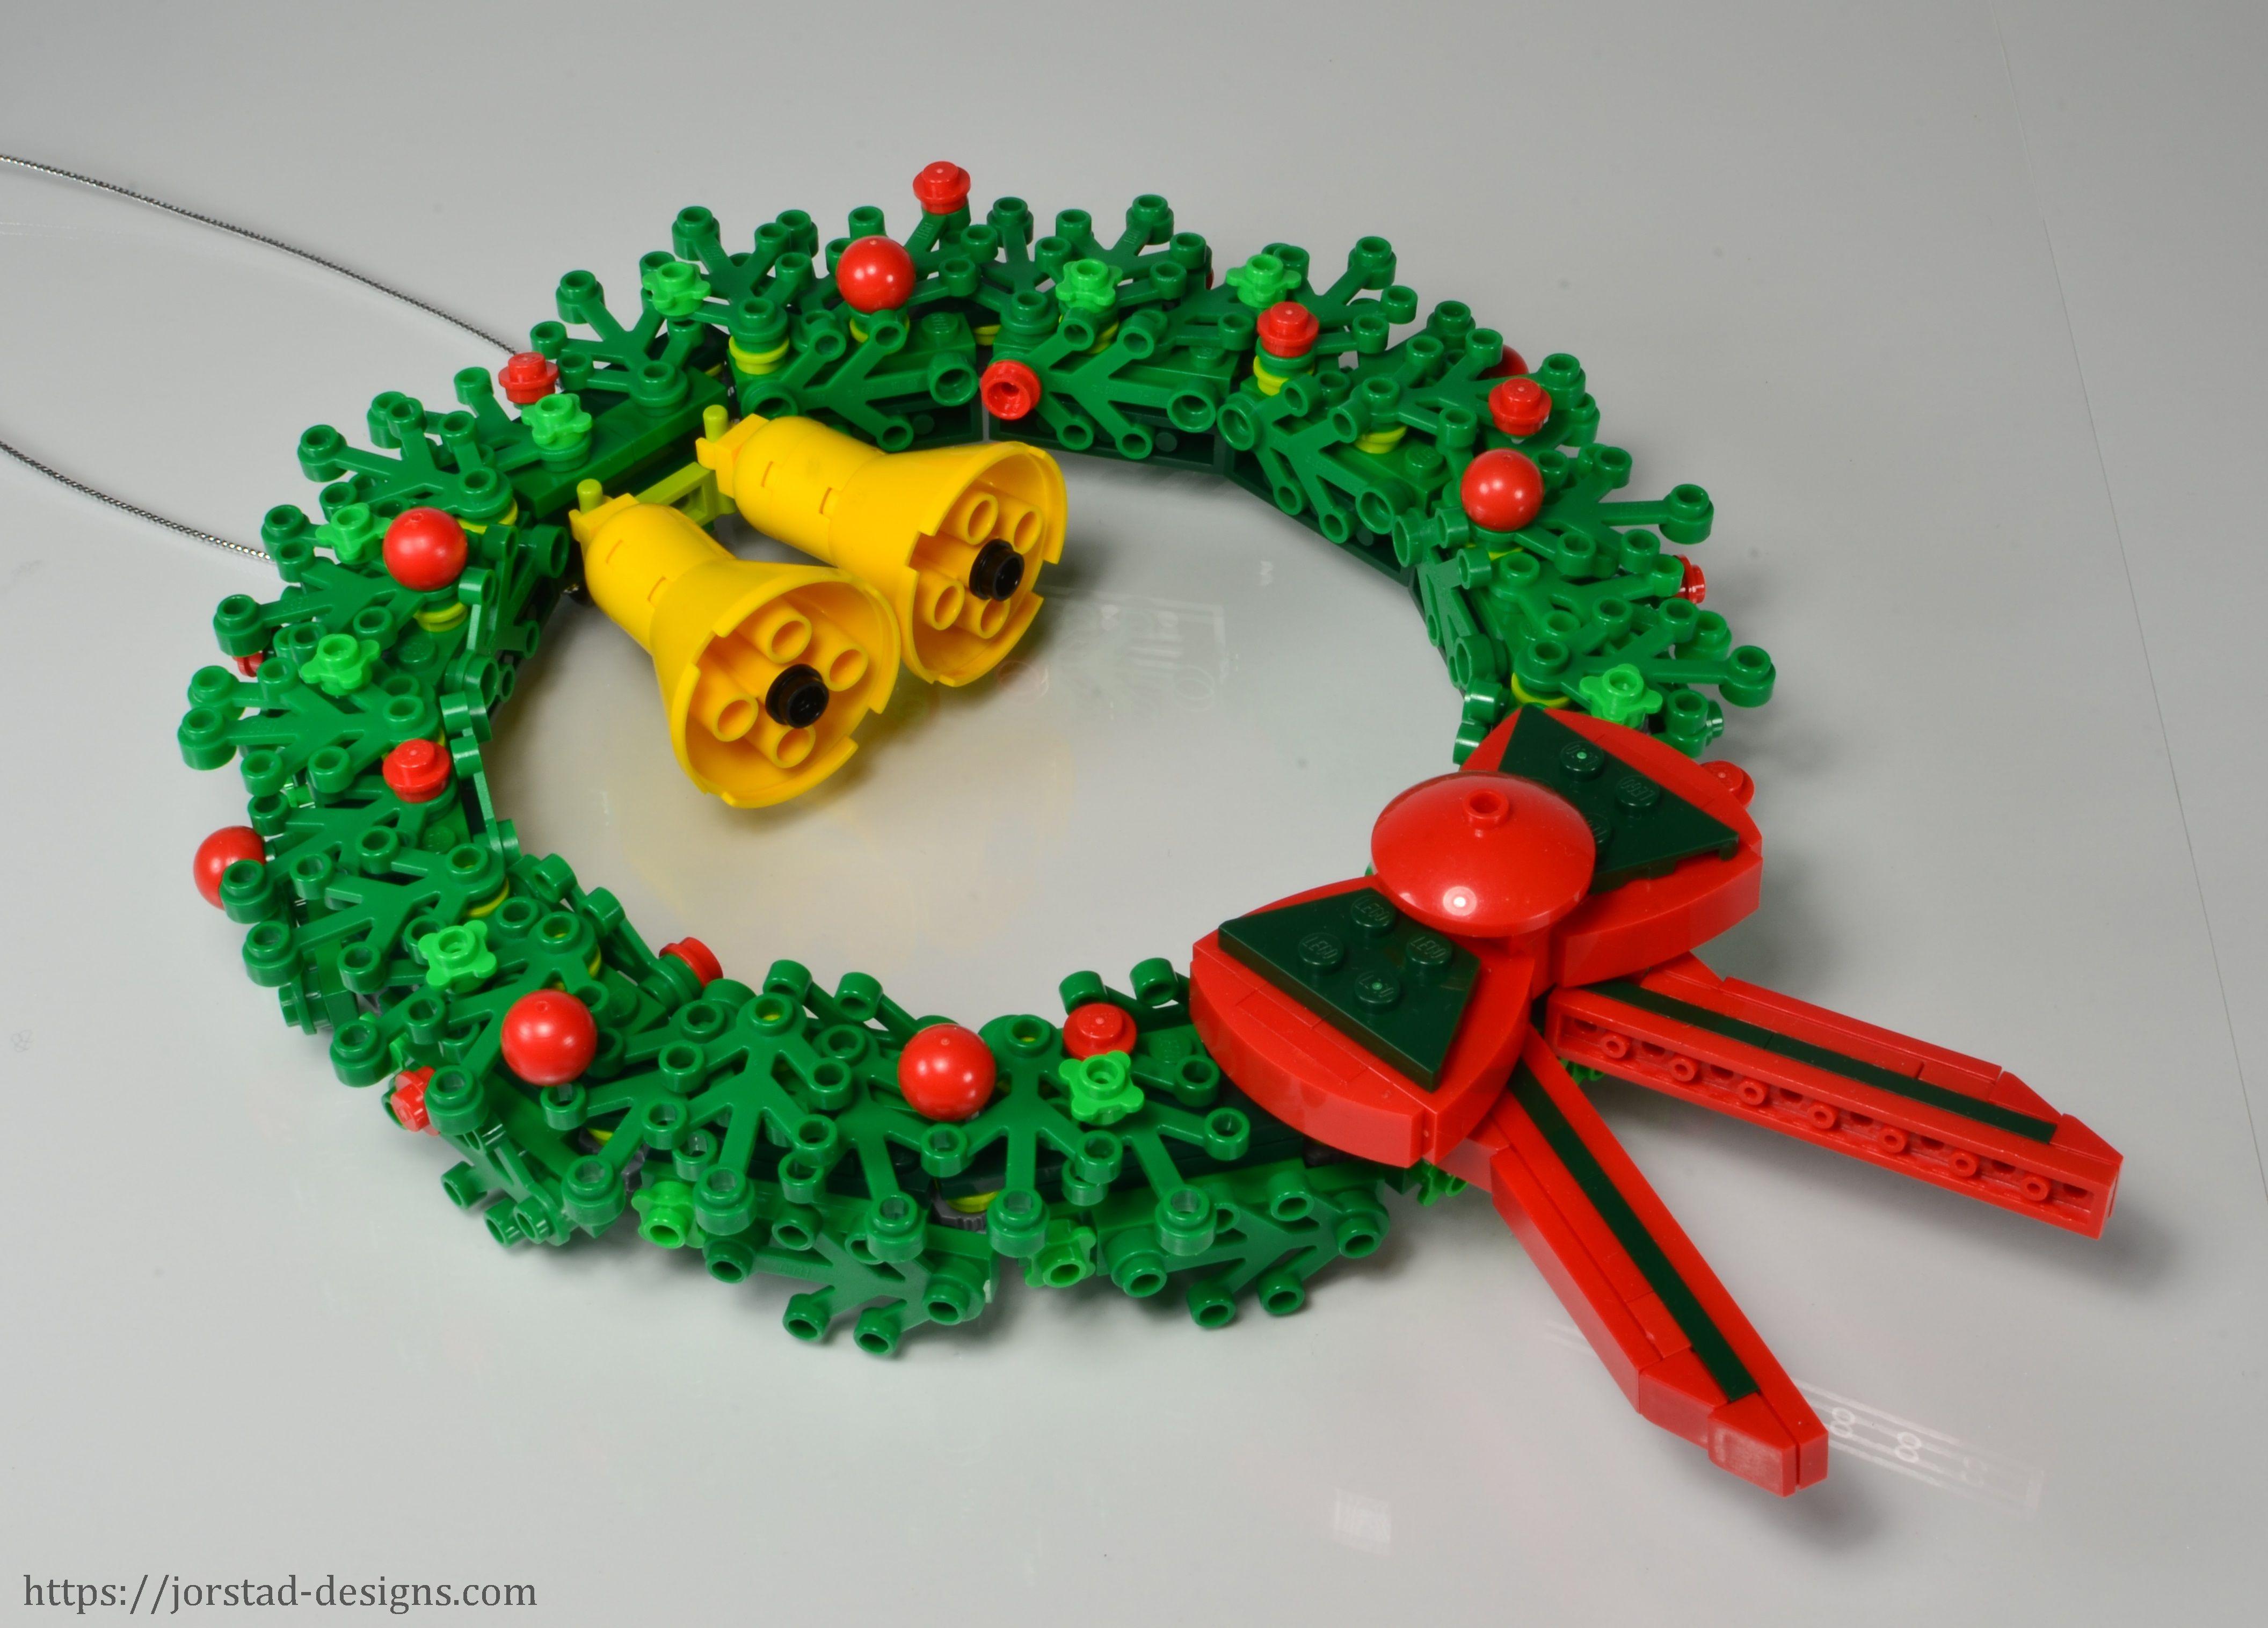 Pin by jorstad designs on lego christmas ornaments pinterest